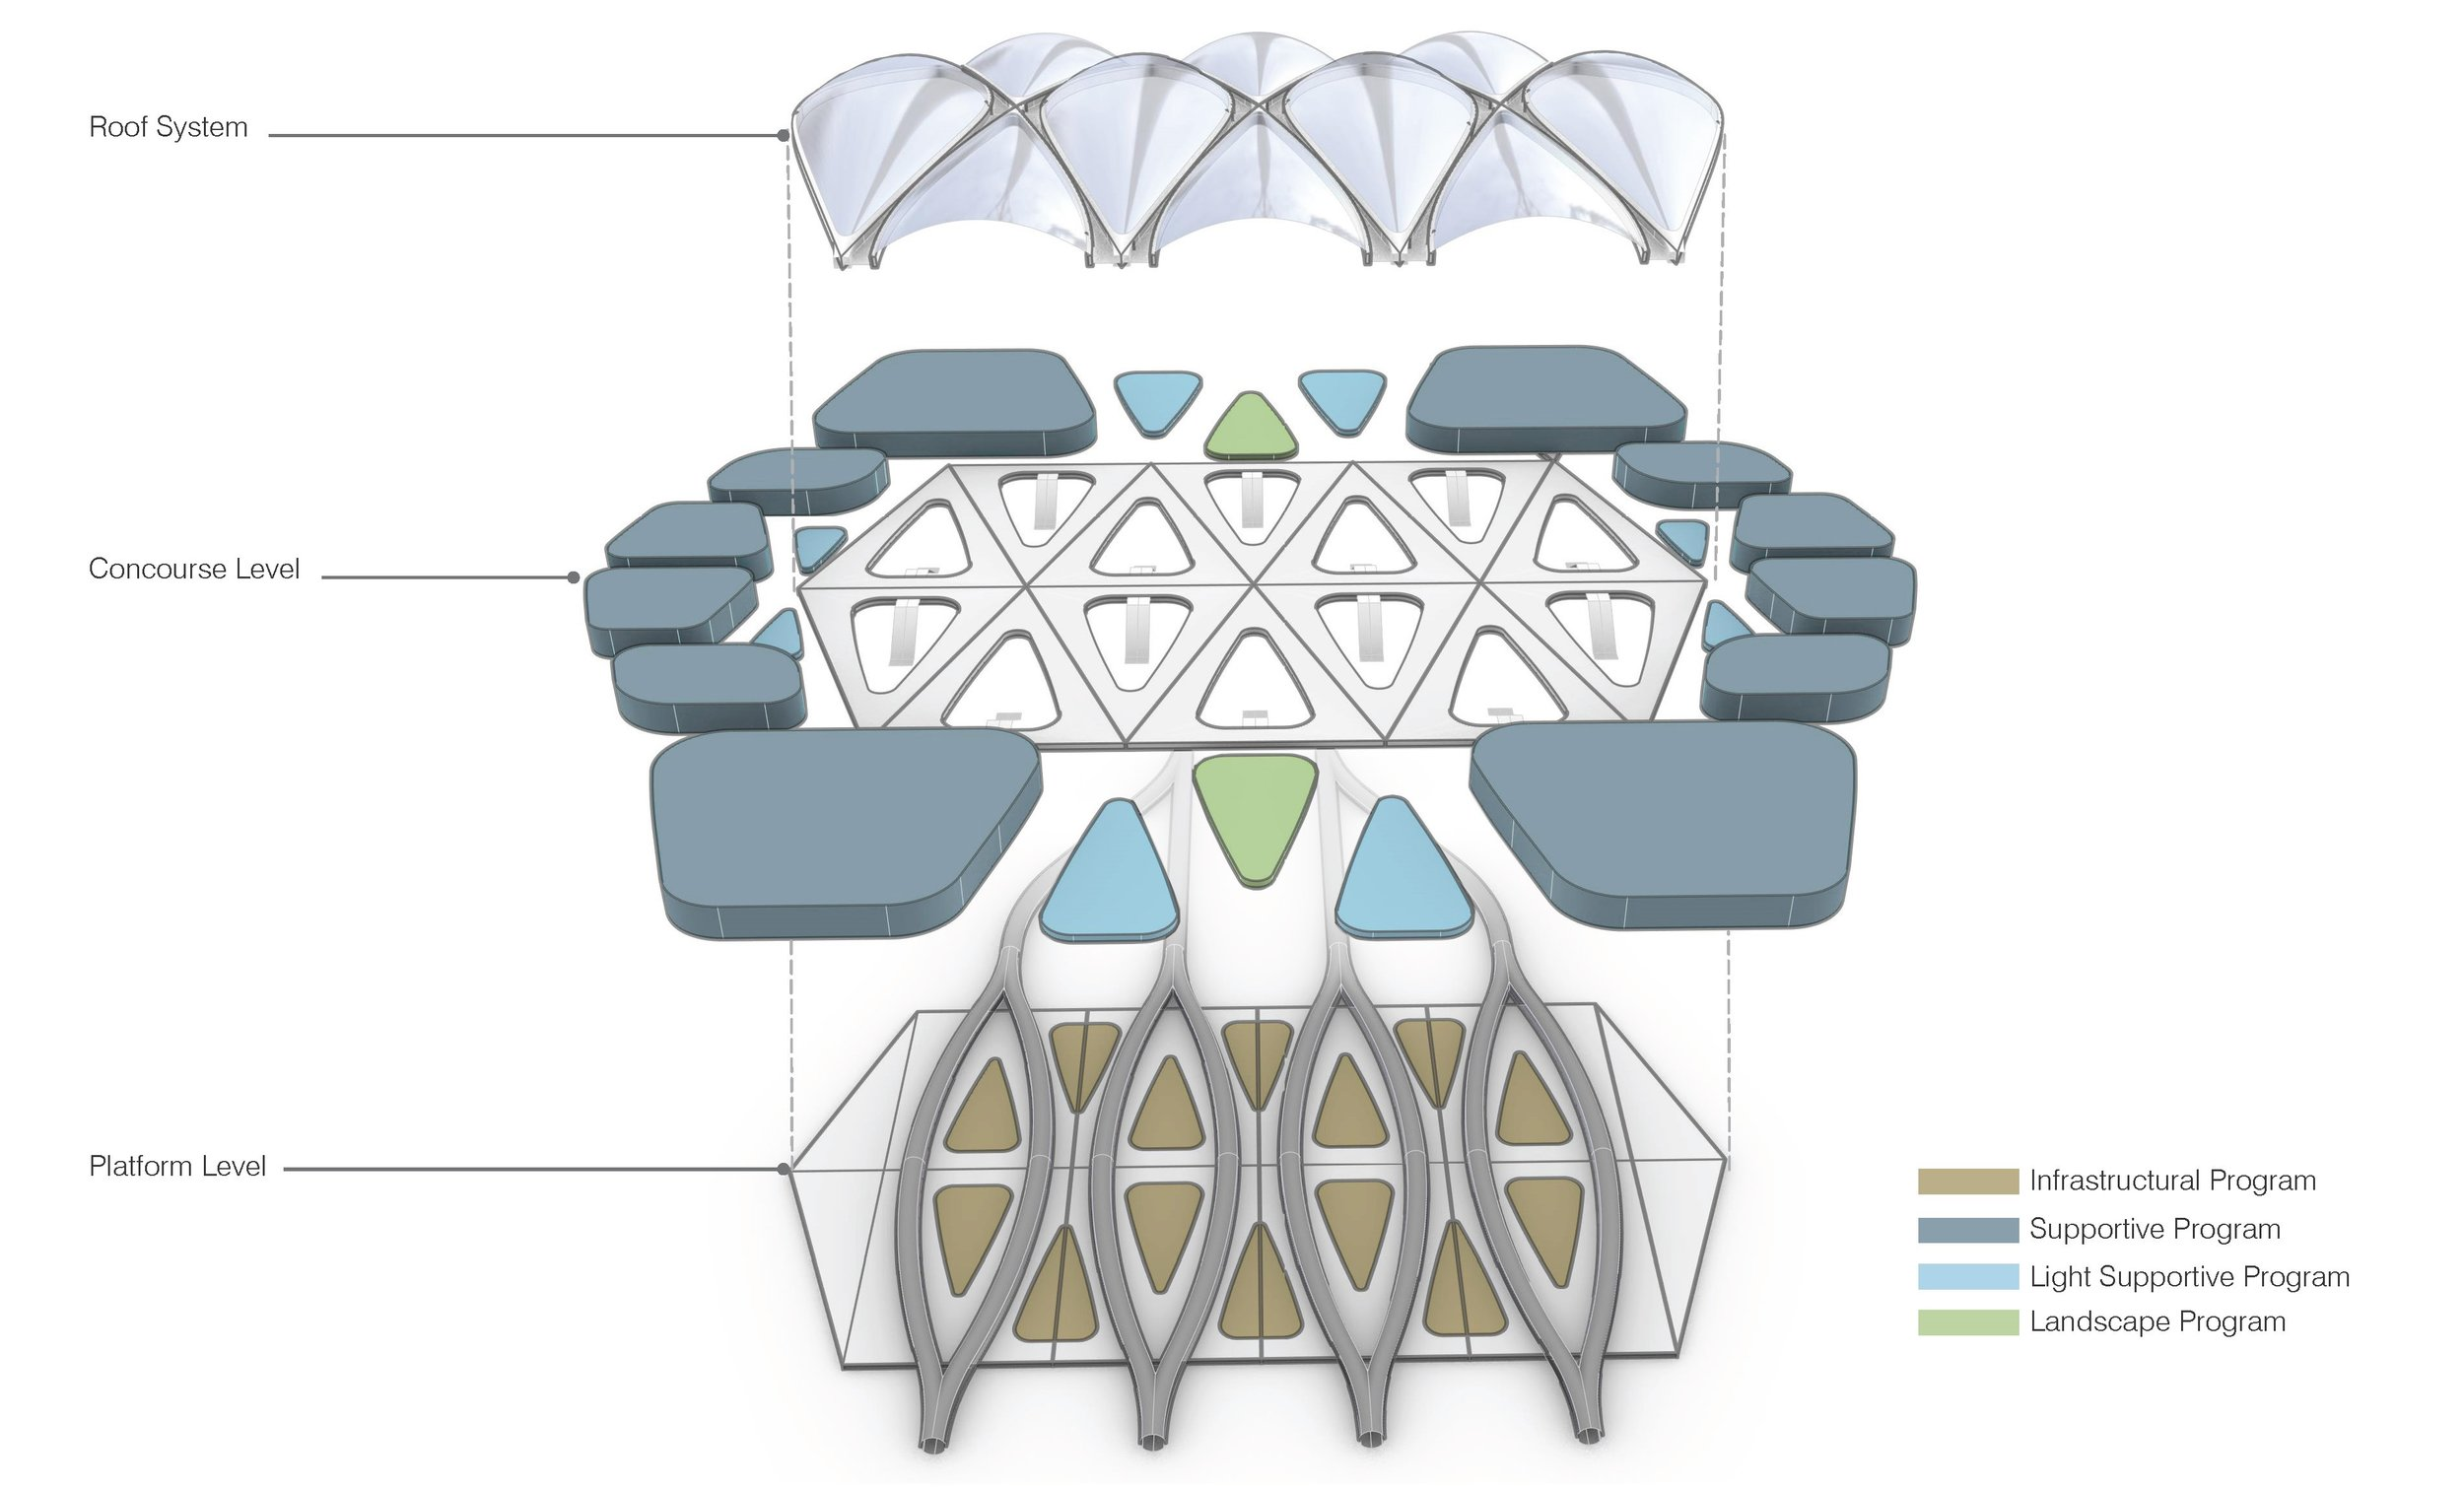 The Station is based on a modular design framework